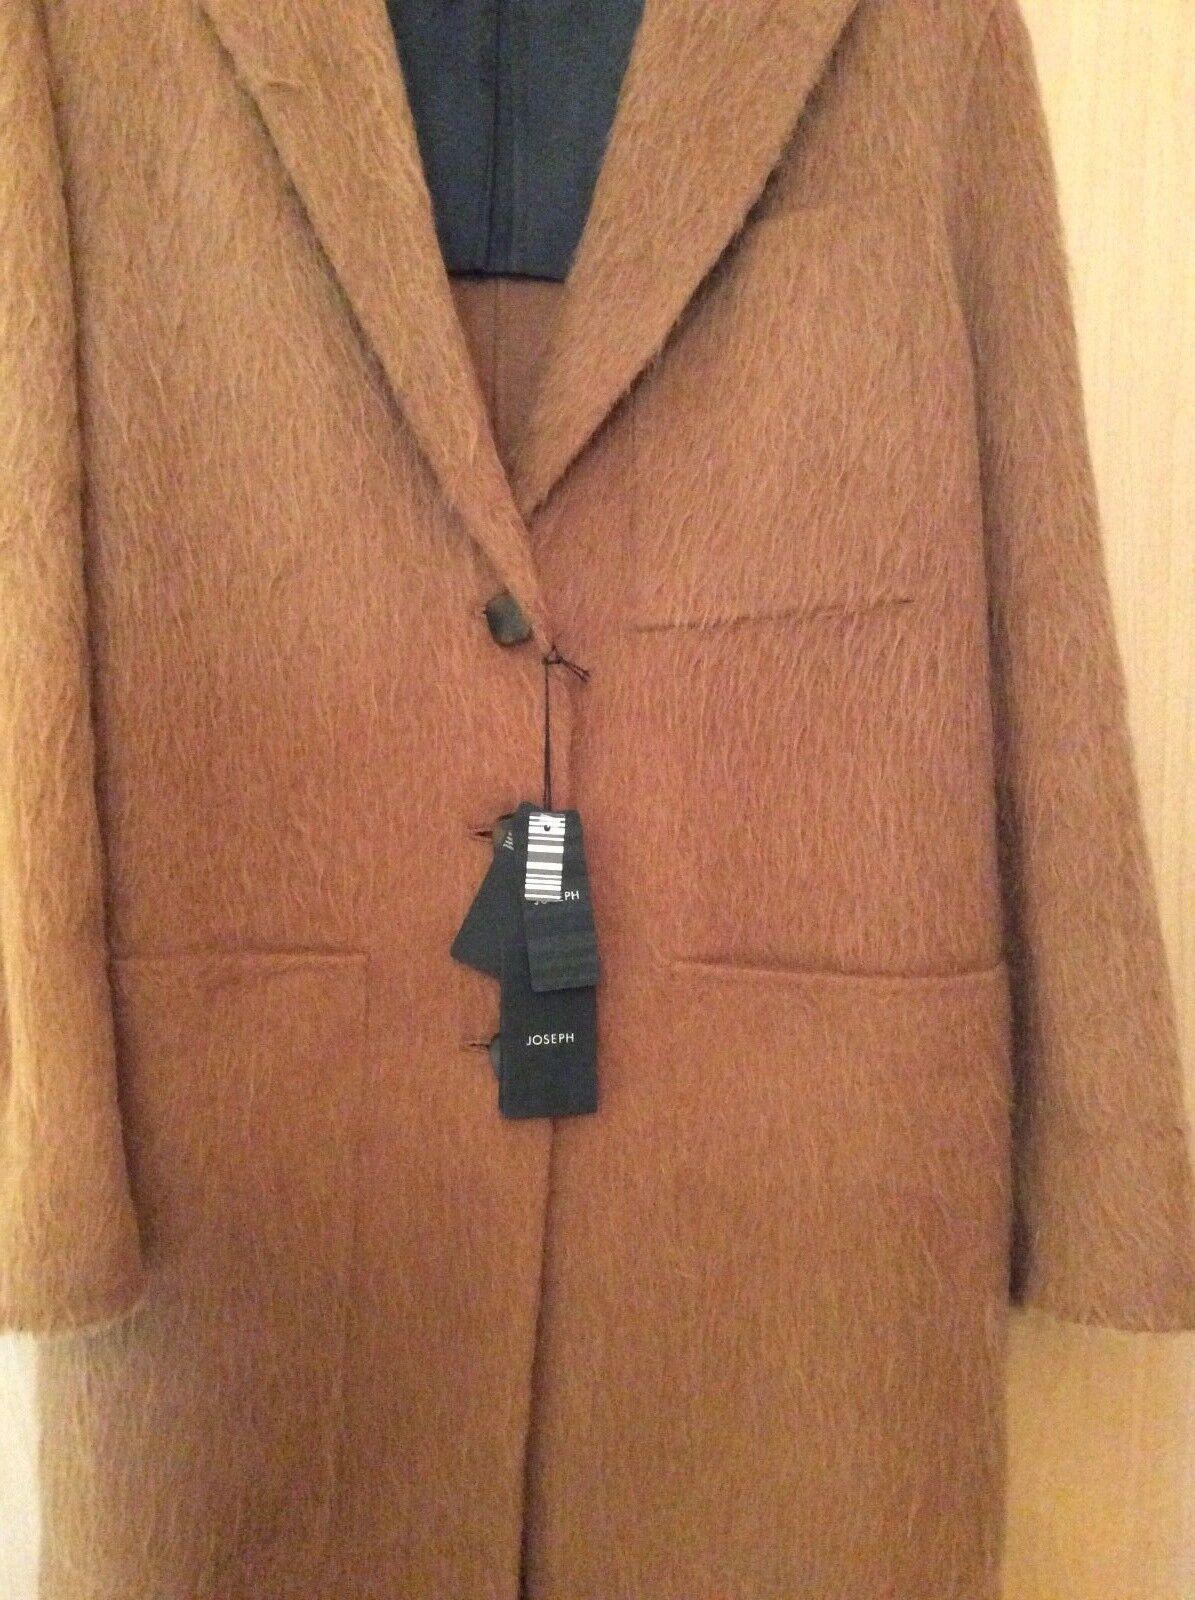 Joseph Jimi Double Double Double Alpaca coat in Toffee 20185e